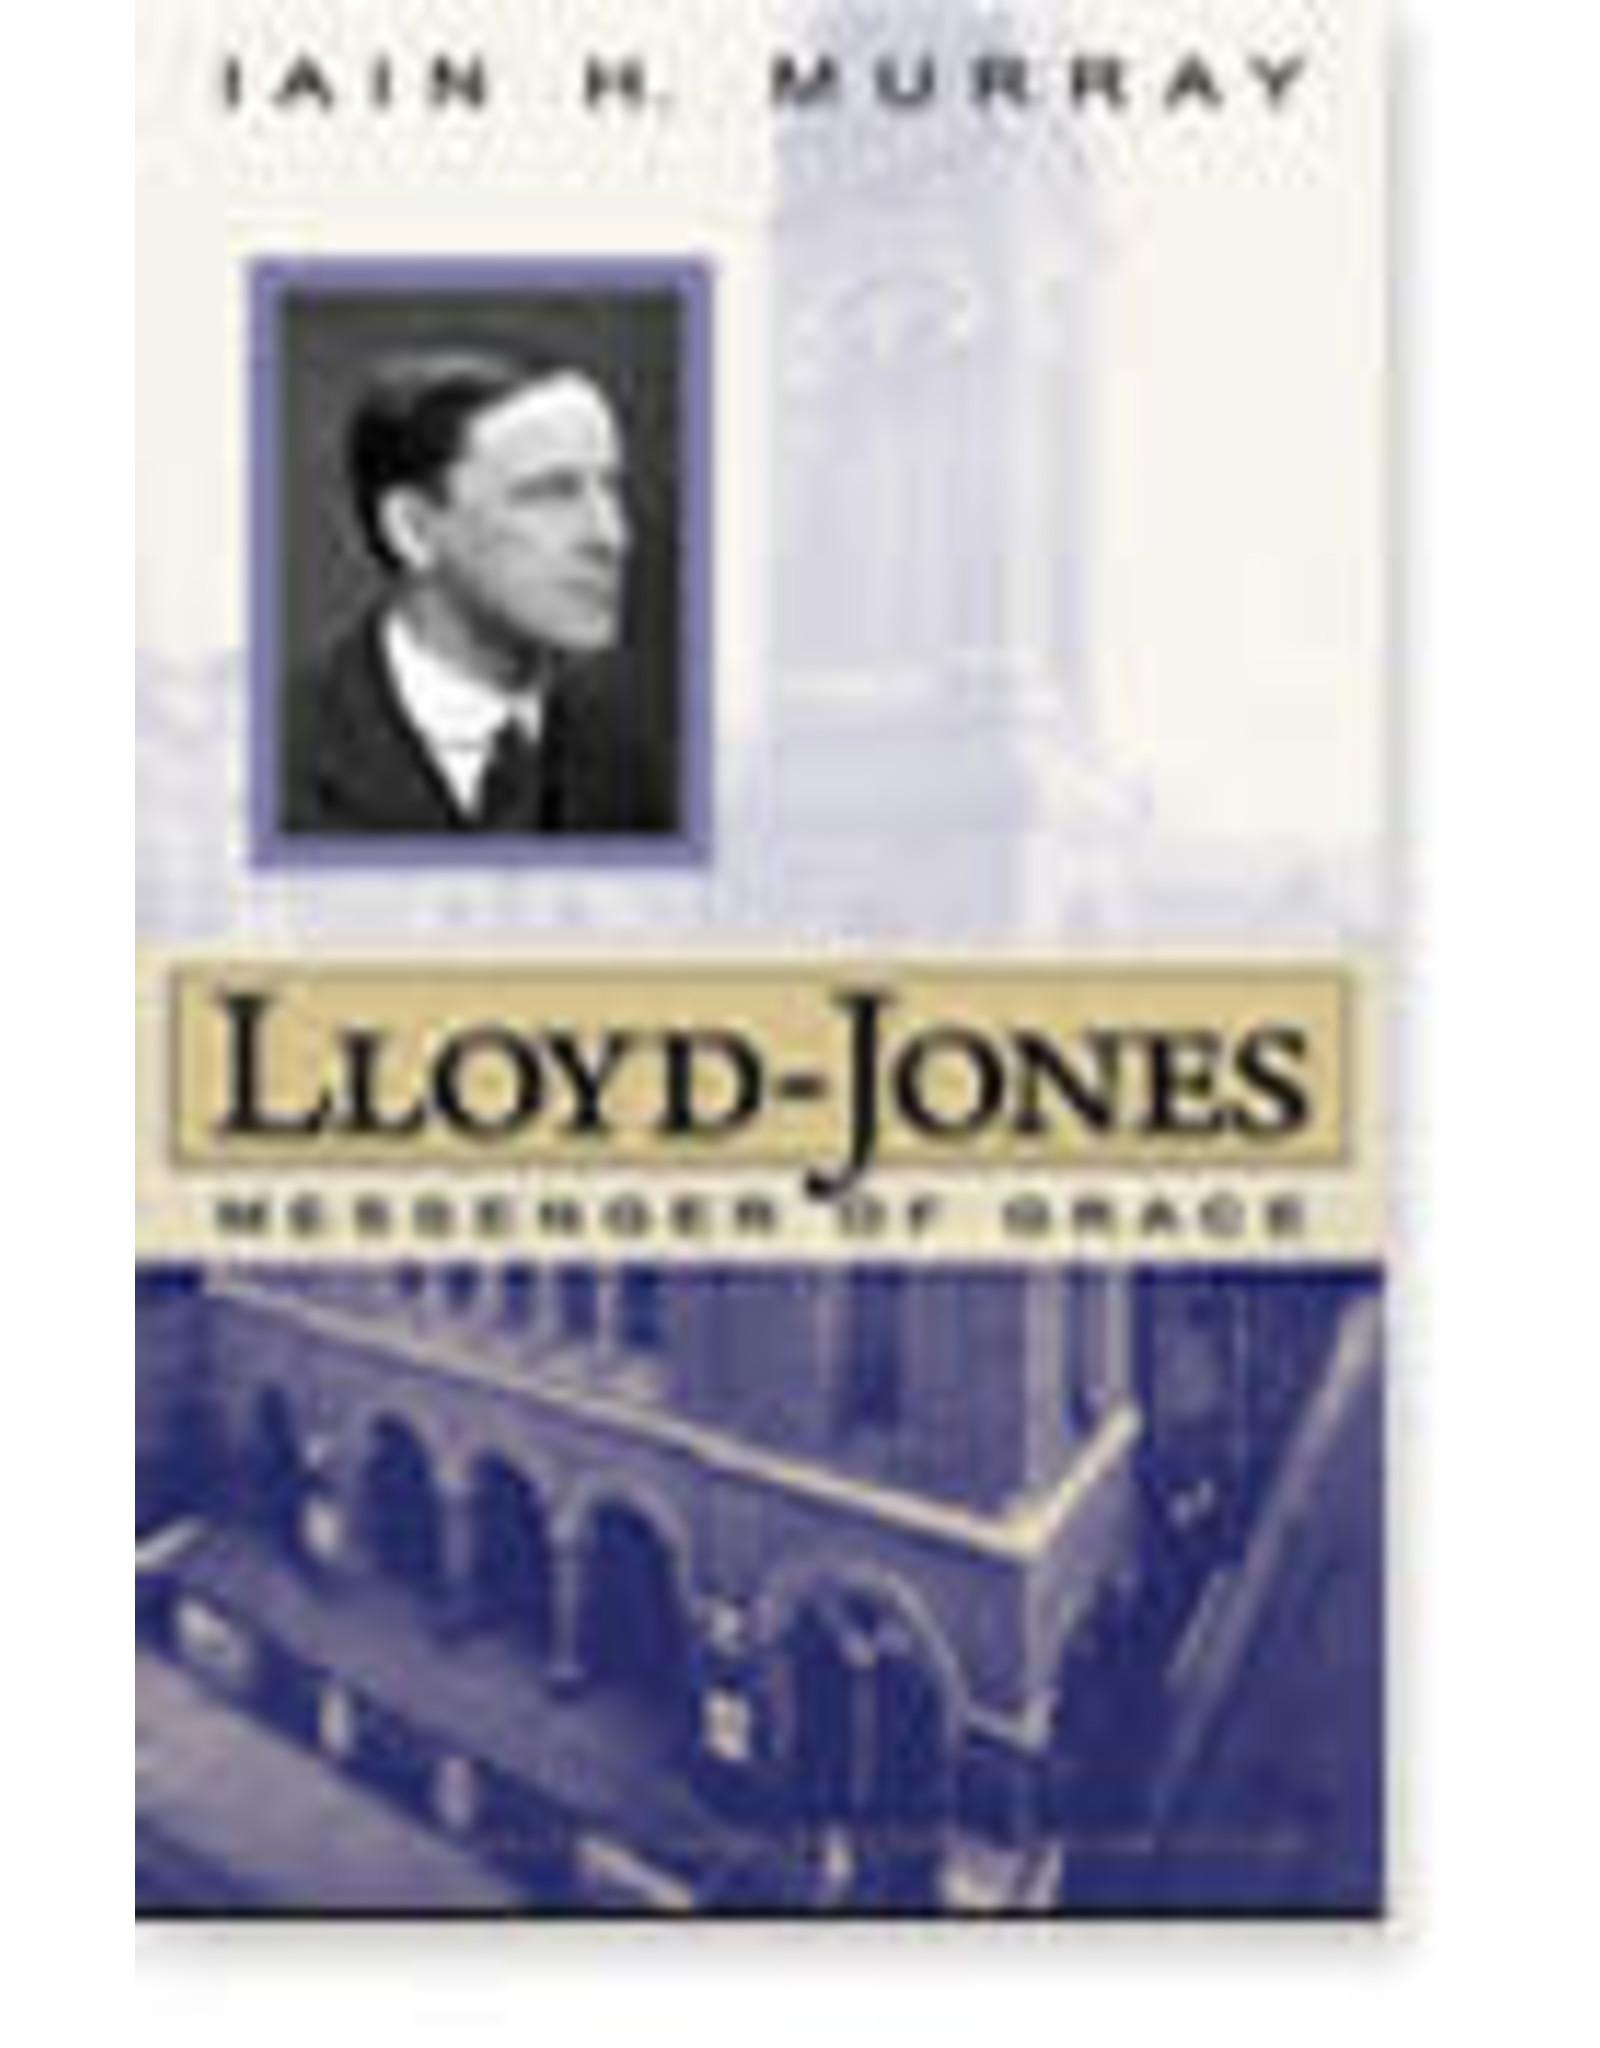 Murray Lloyd - Jones: Messenger of Grace